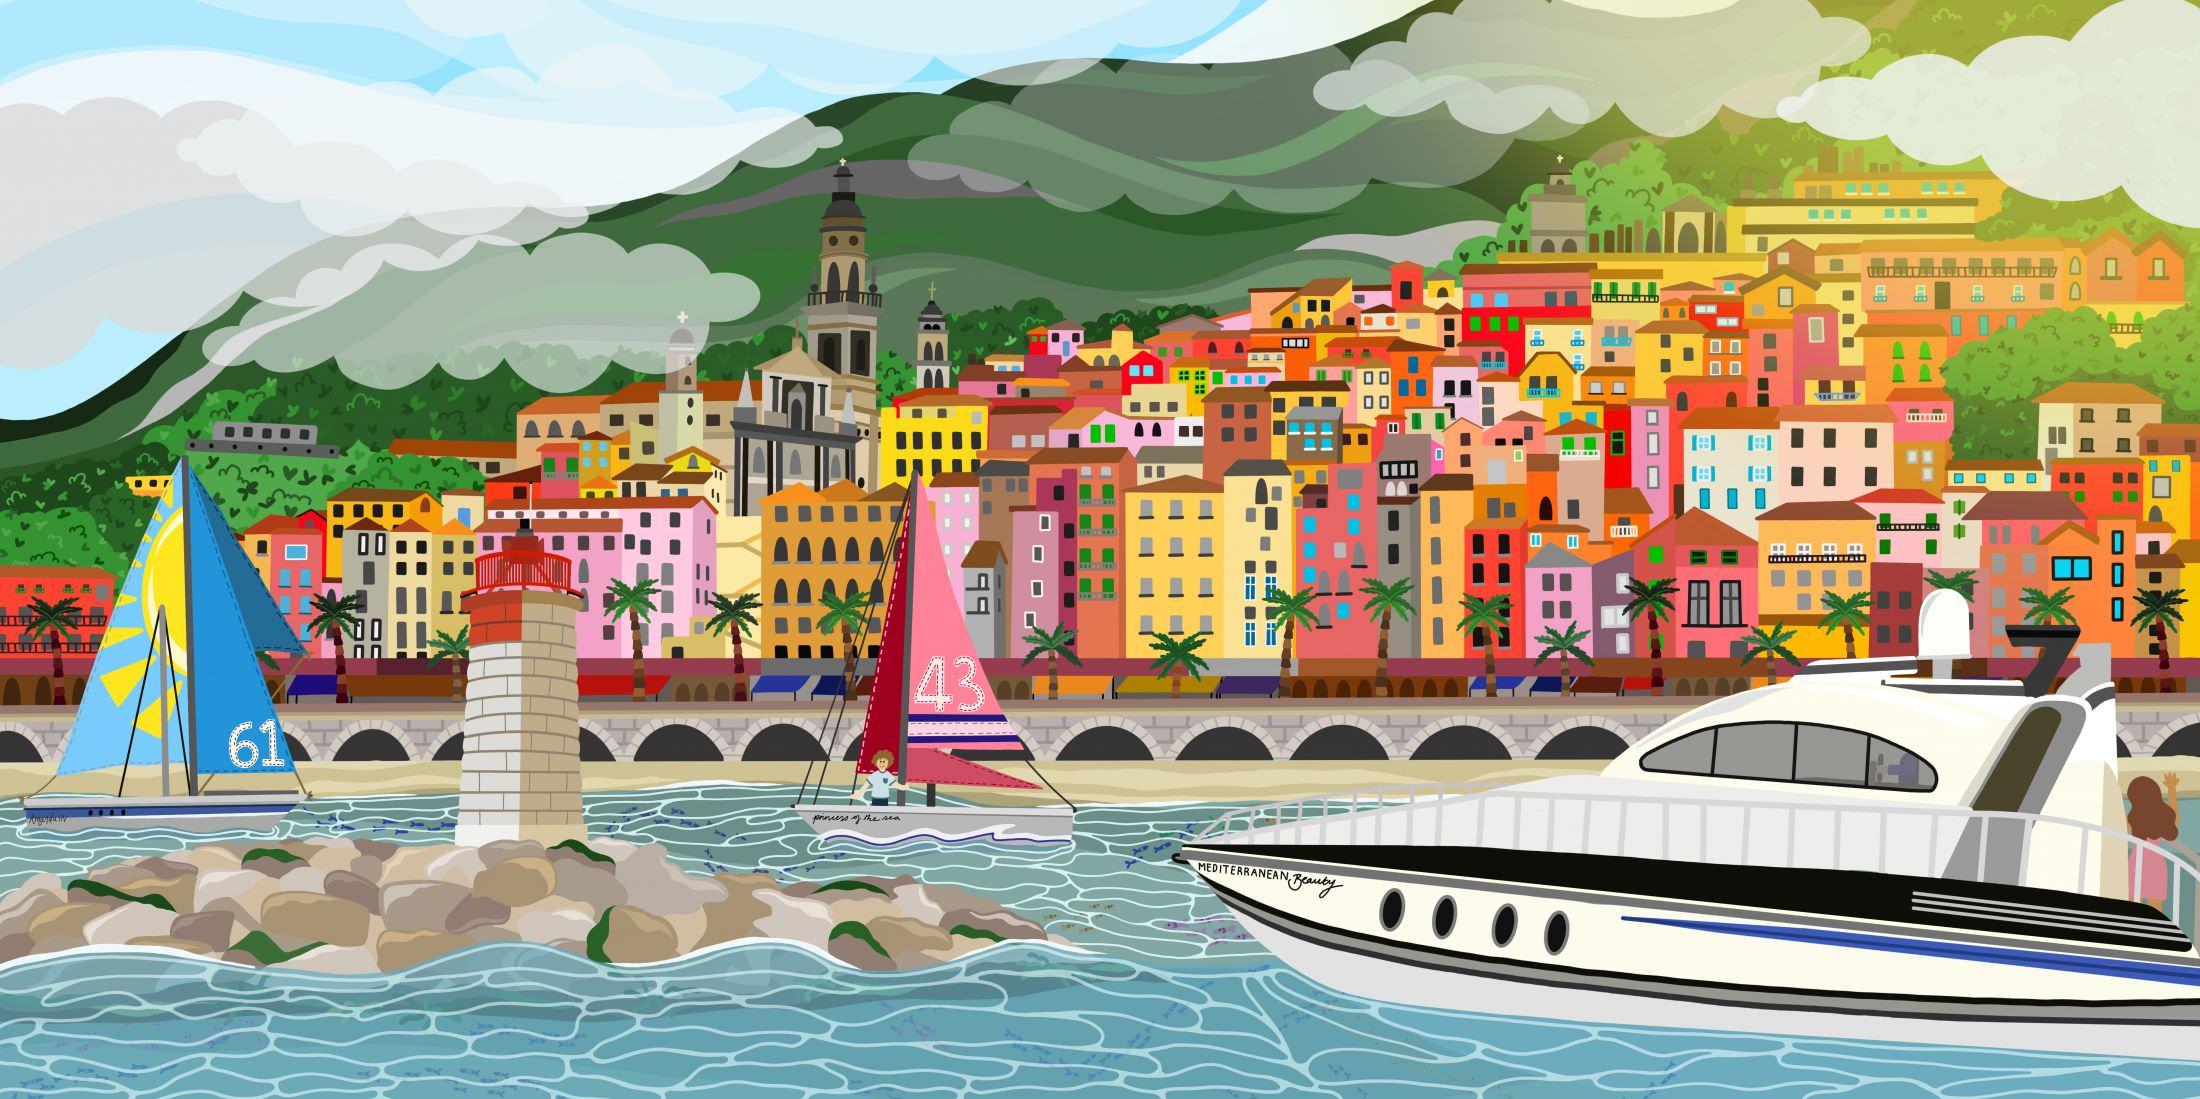 mediterraneo illustrato